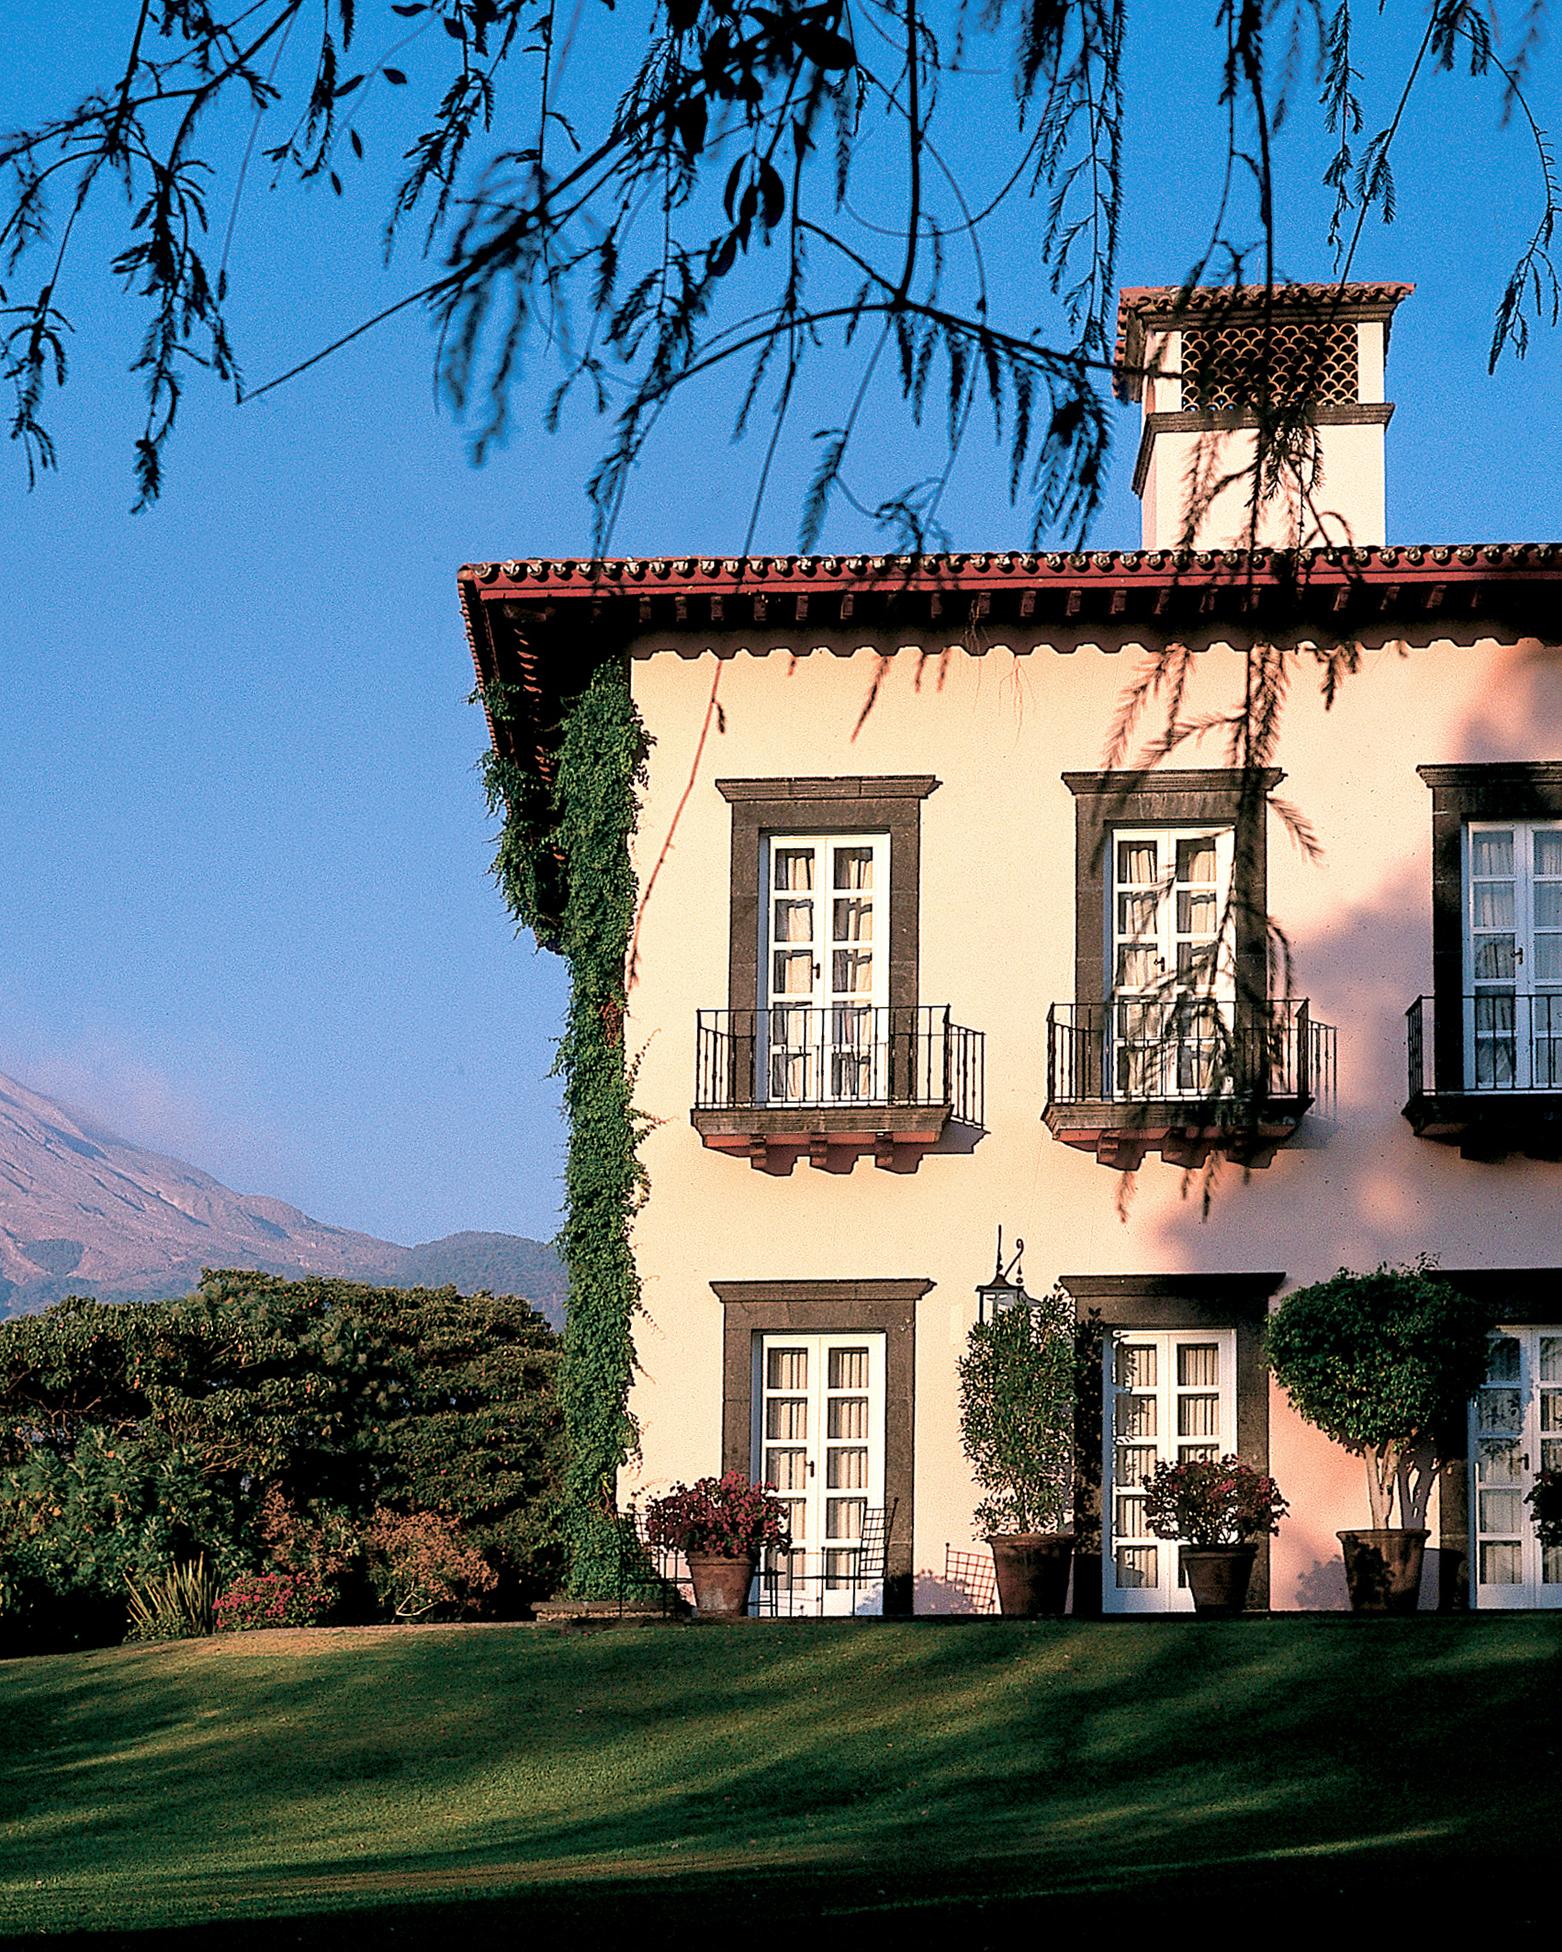 hacienda-de-san-antonio-mexico-mwd1011mmsmith.jpg